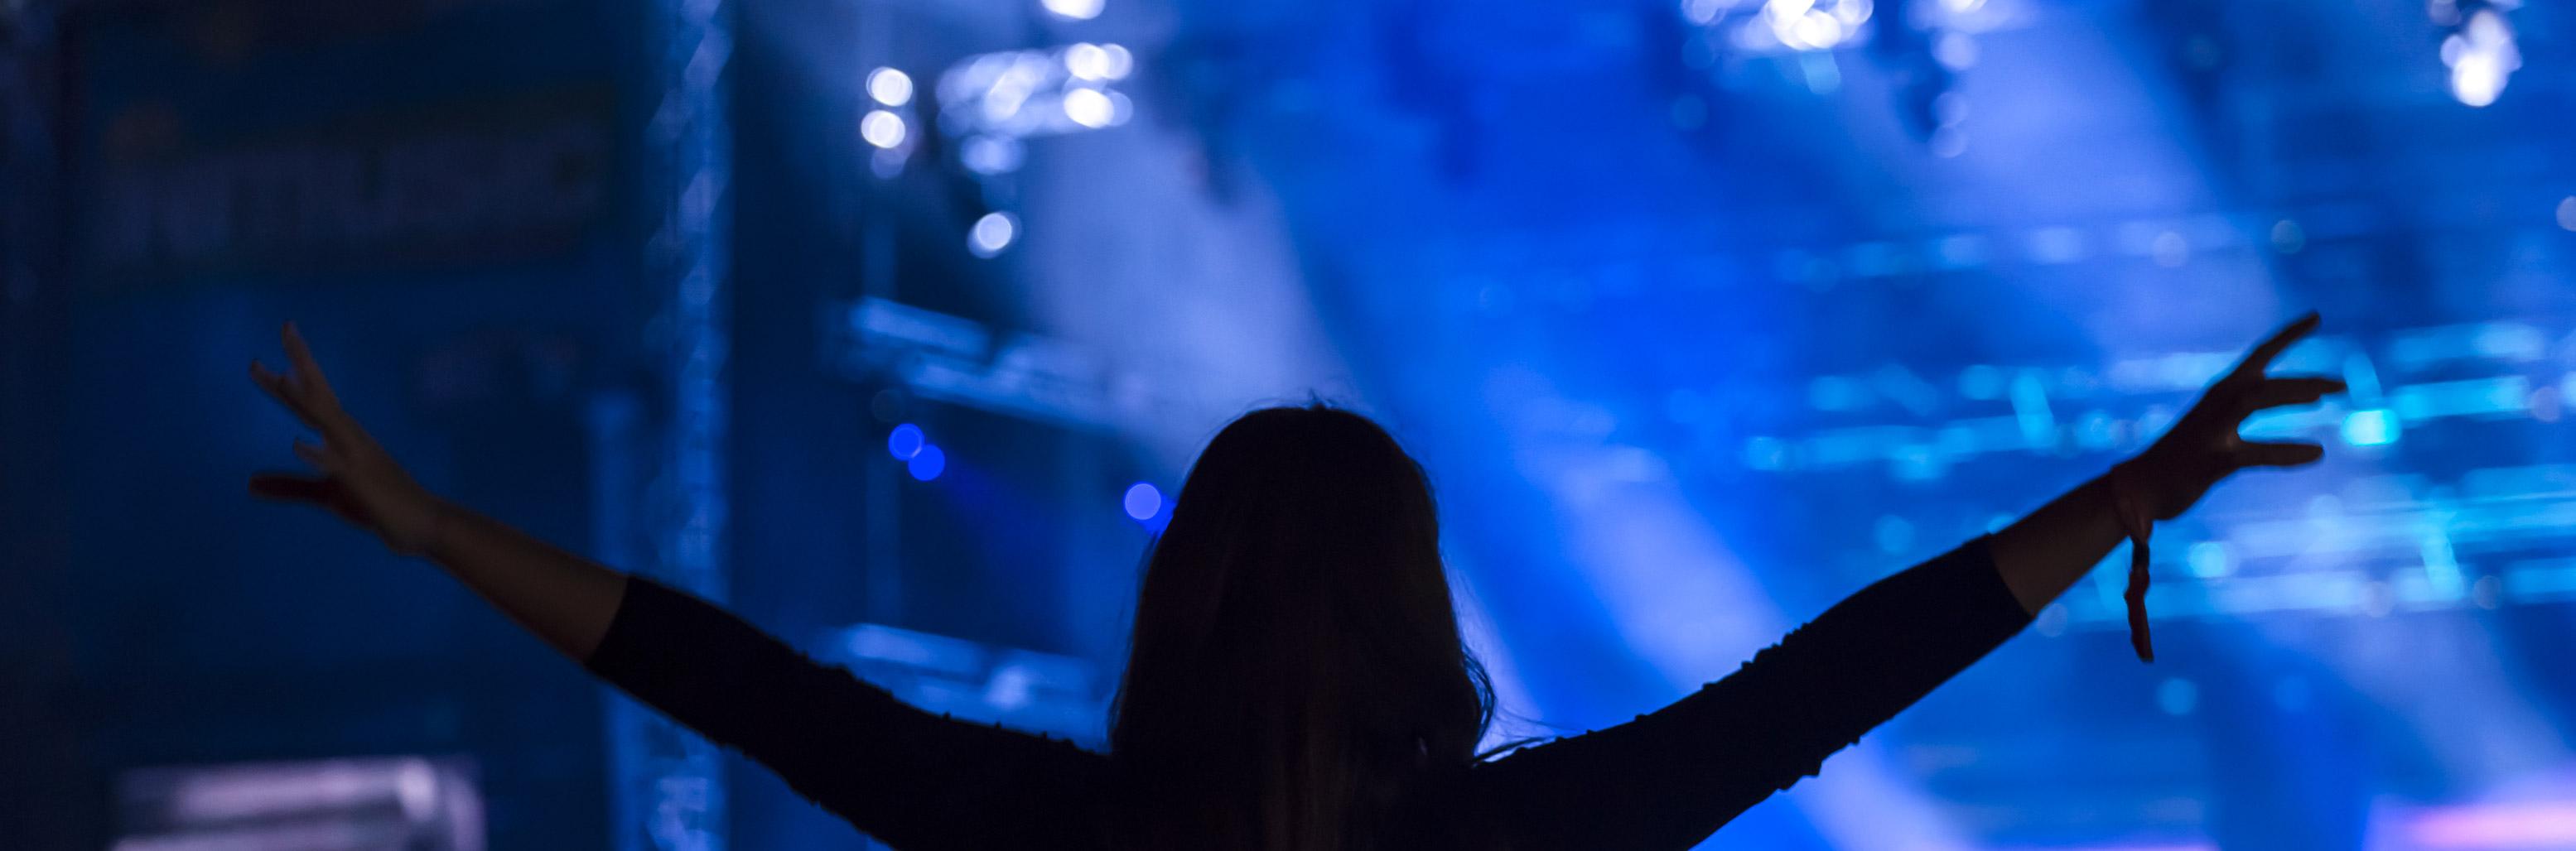 concertcrowd.jpg